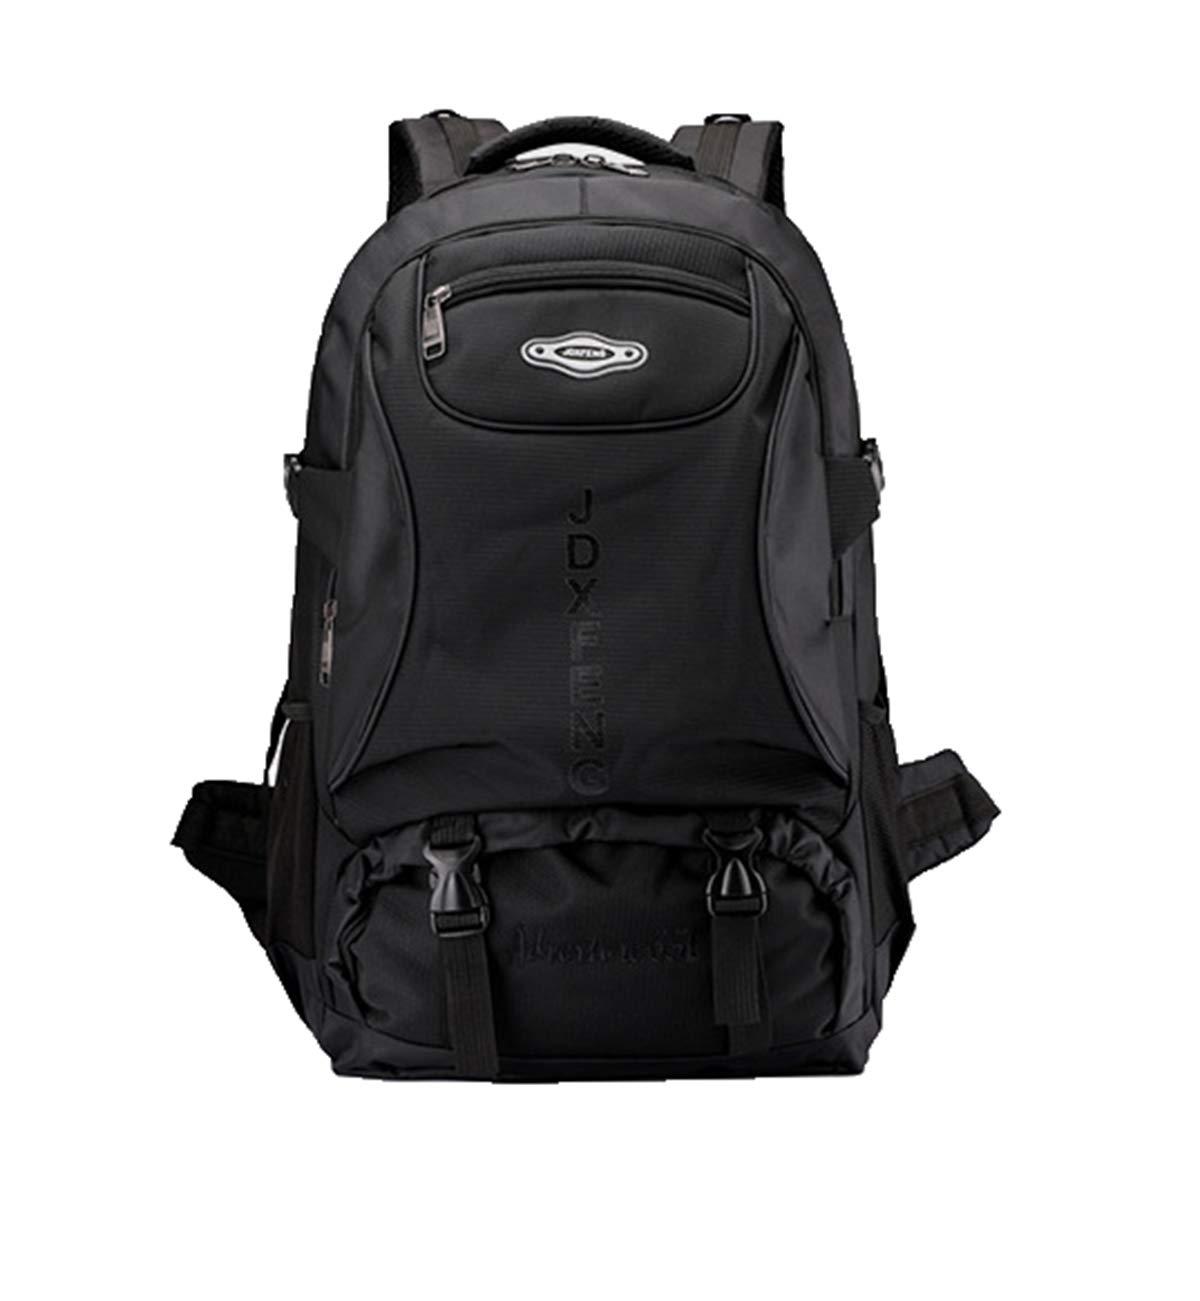 DaQao Multifunktional Nylon Schoolbag Damen Groß Backpack Wasserdicht Verschleißfest Ranzen Herren Outdoor Casual Rucksack B07LCCFJKK Daypacks Langfristiger Ruf